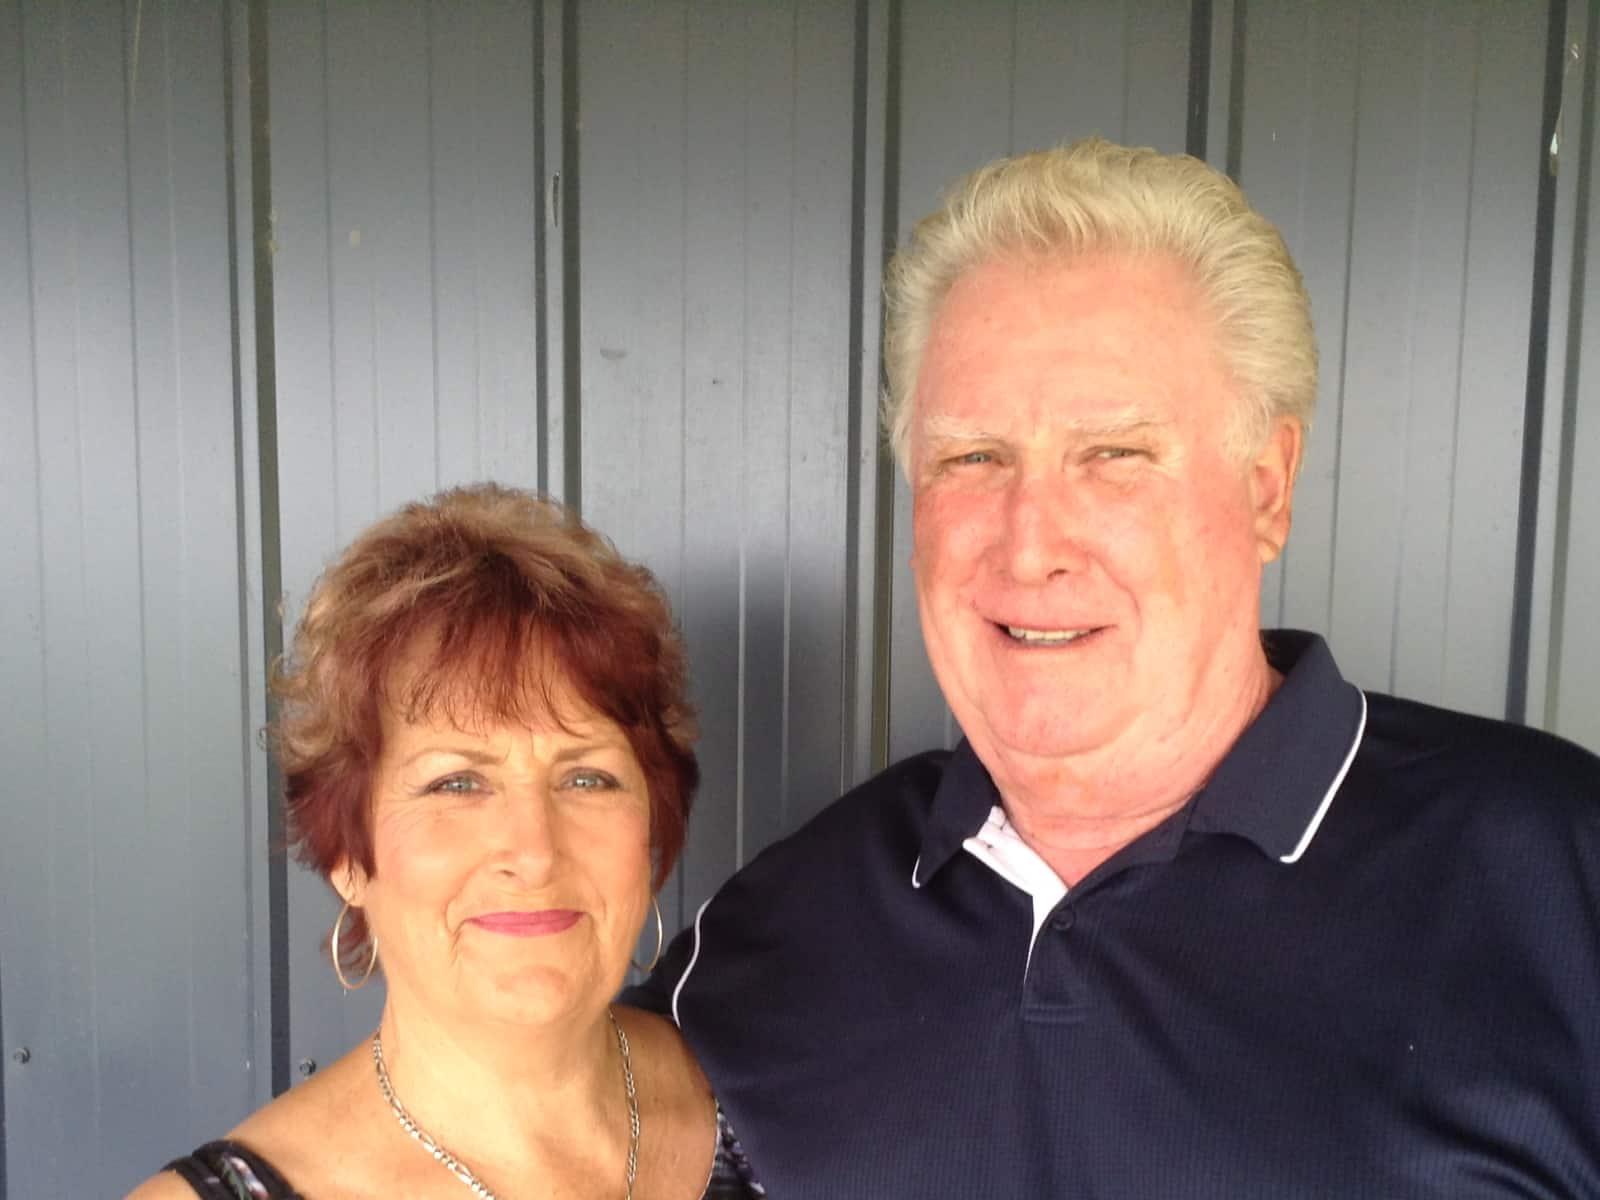 Lynette & Louis from Murwillumbah, New South Wales, Australia